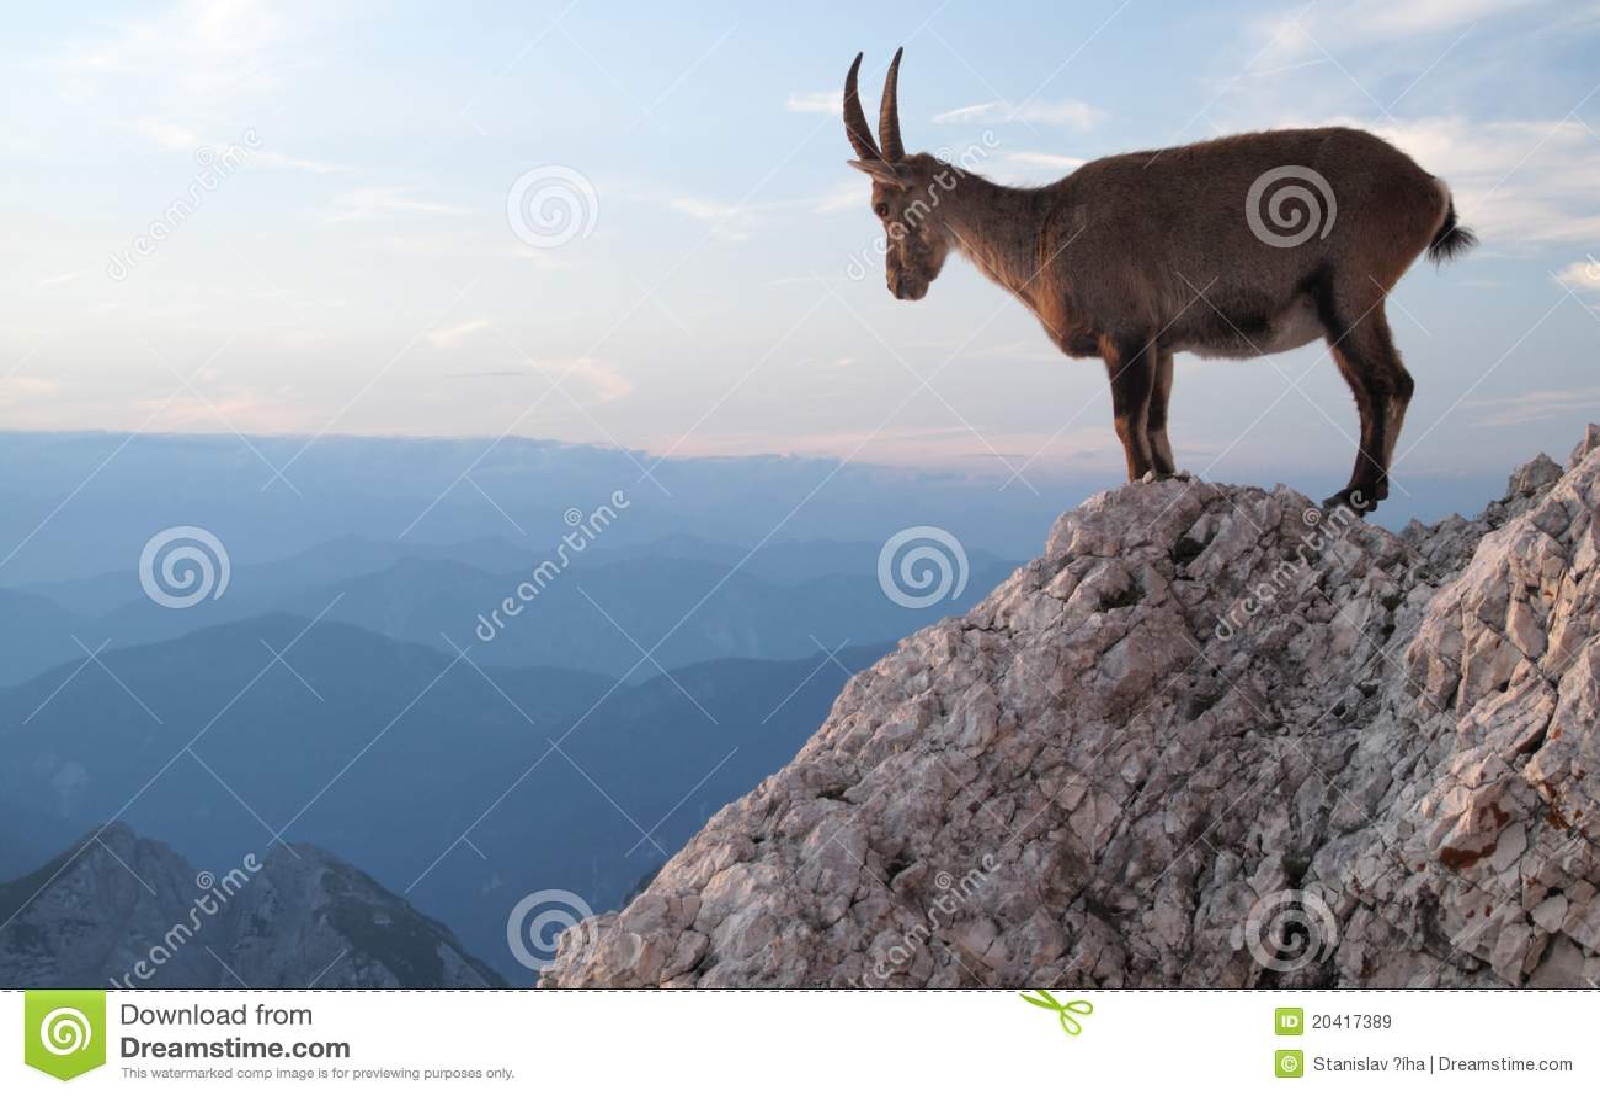 Cabra de montaña - cabra montés alpestre